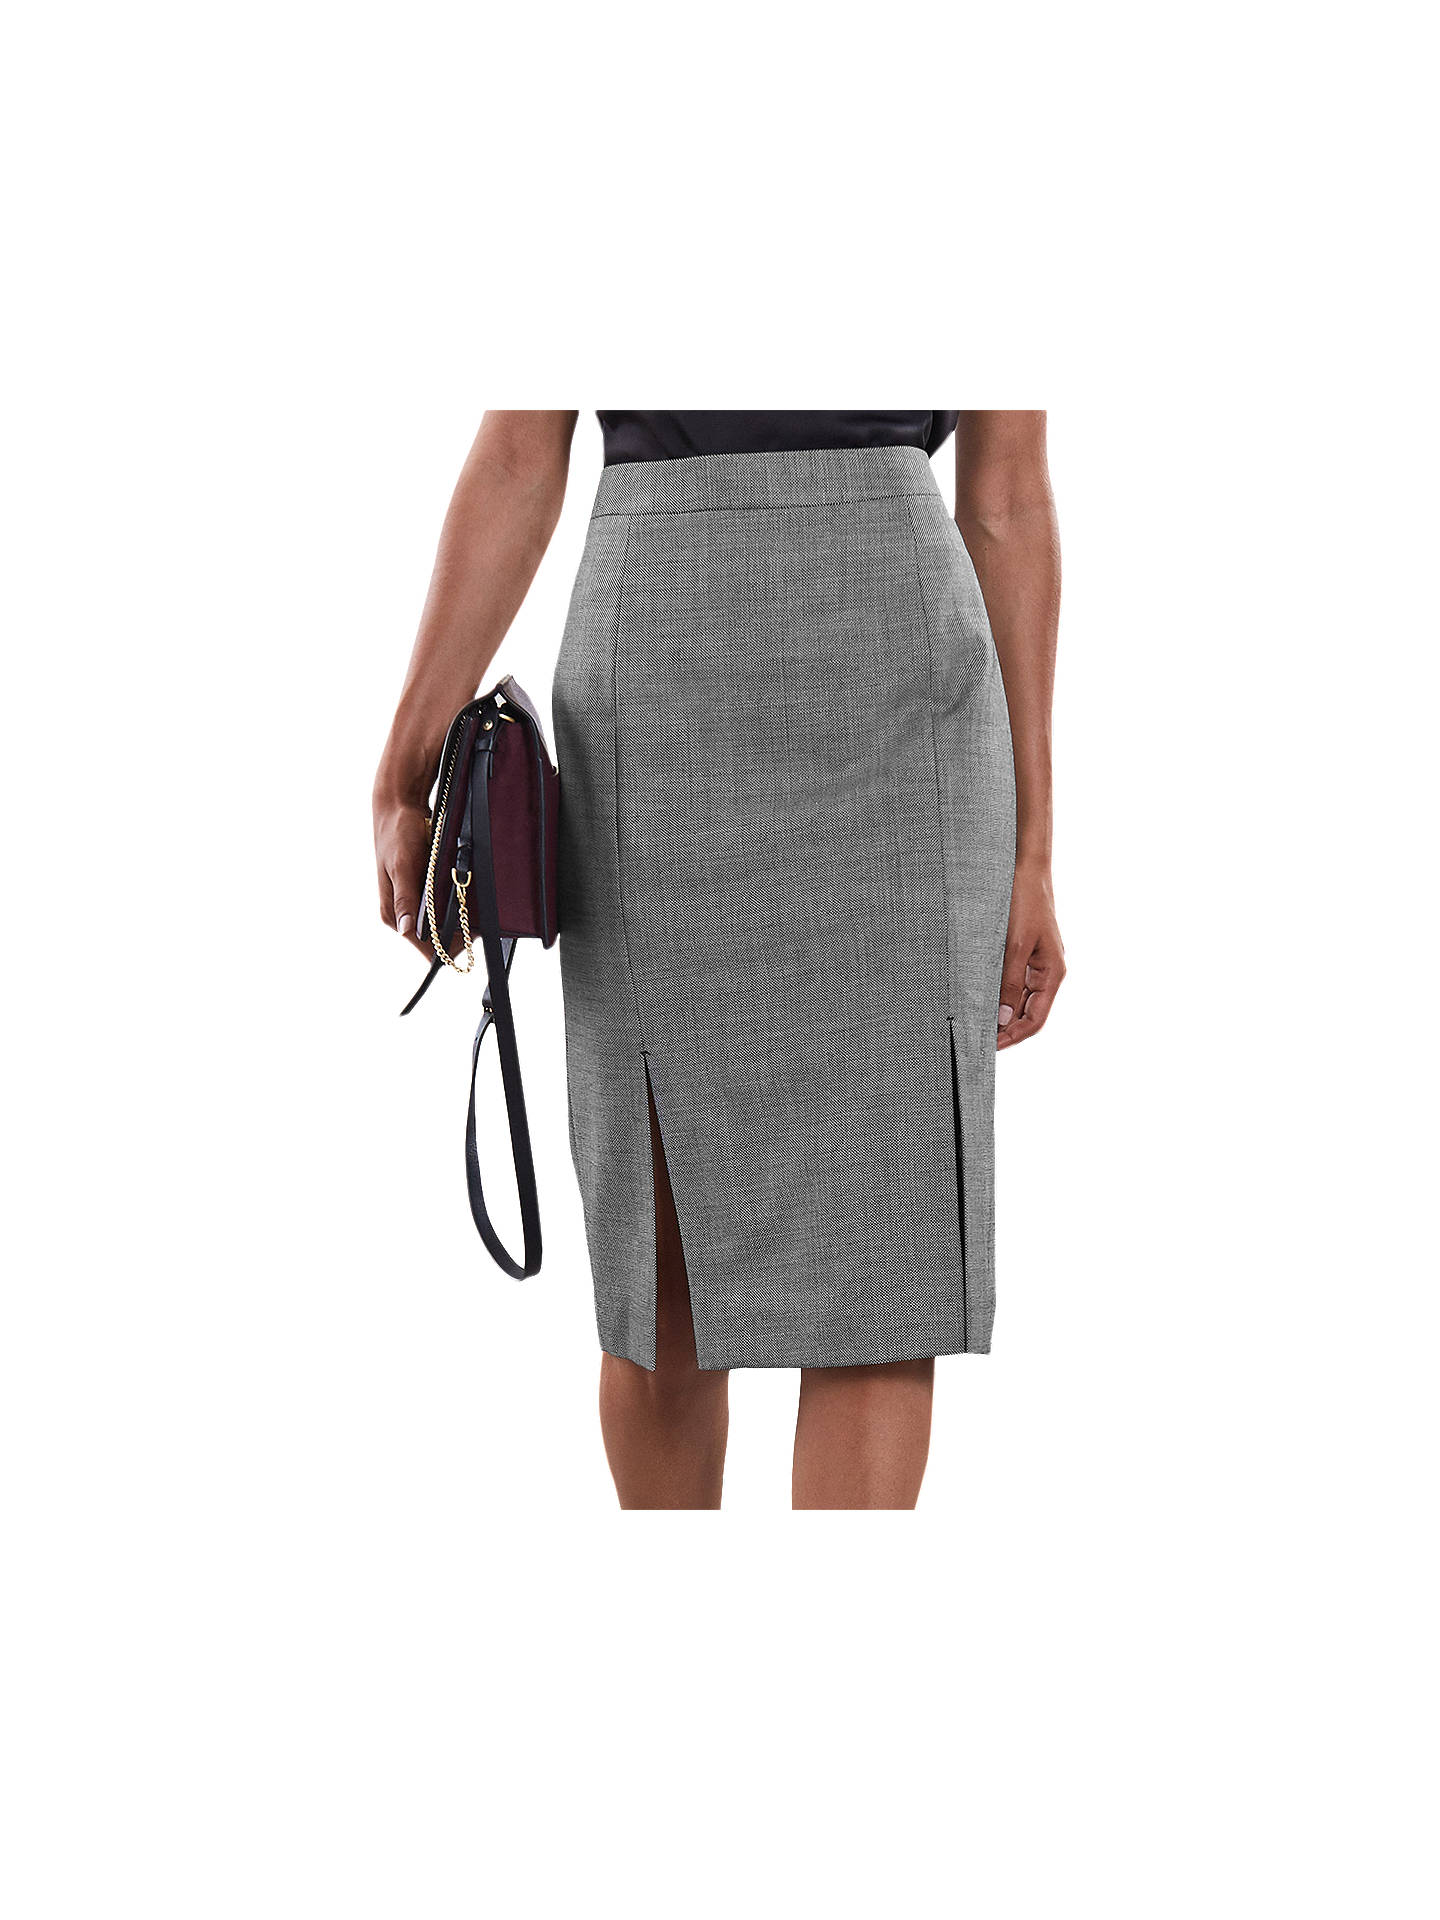 0a225668b1 Buy Reiss Alber Pencil Skirt, Grey, 6 Online at johnlewis.com ...